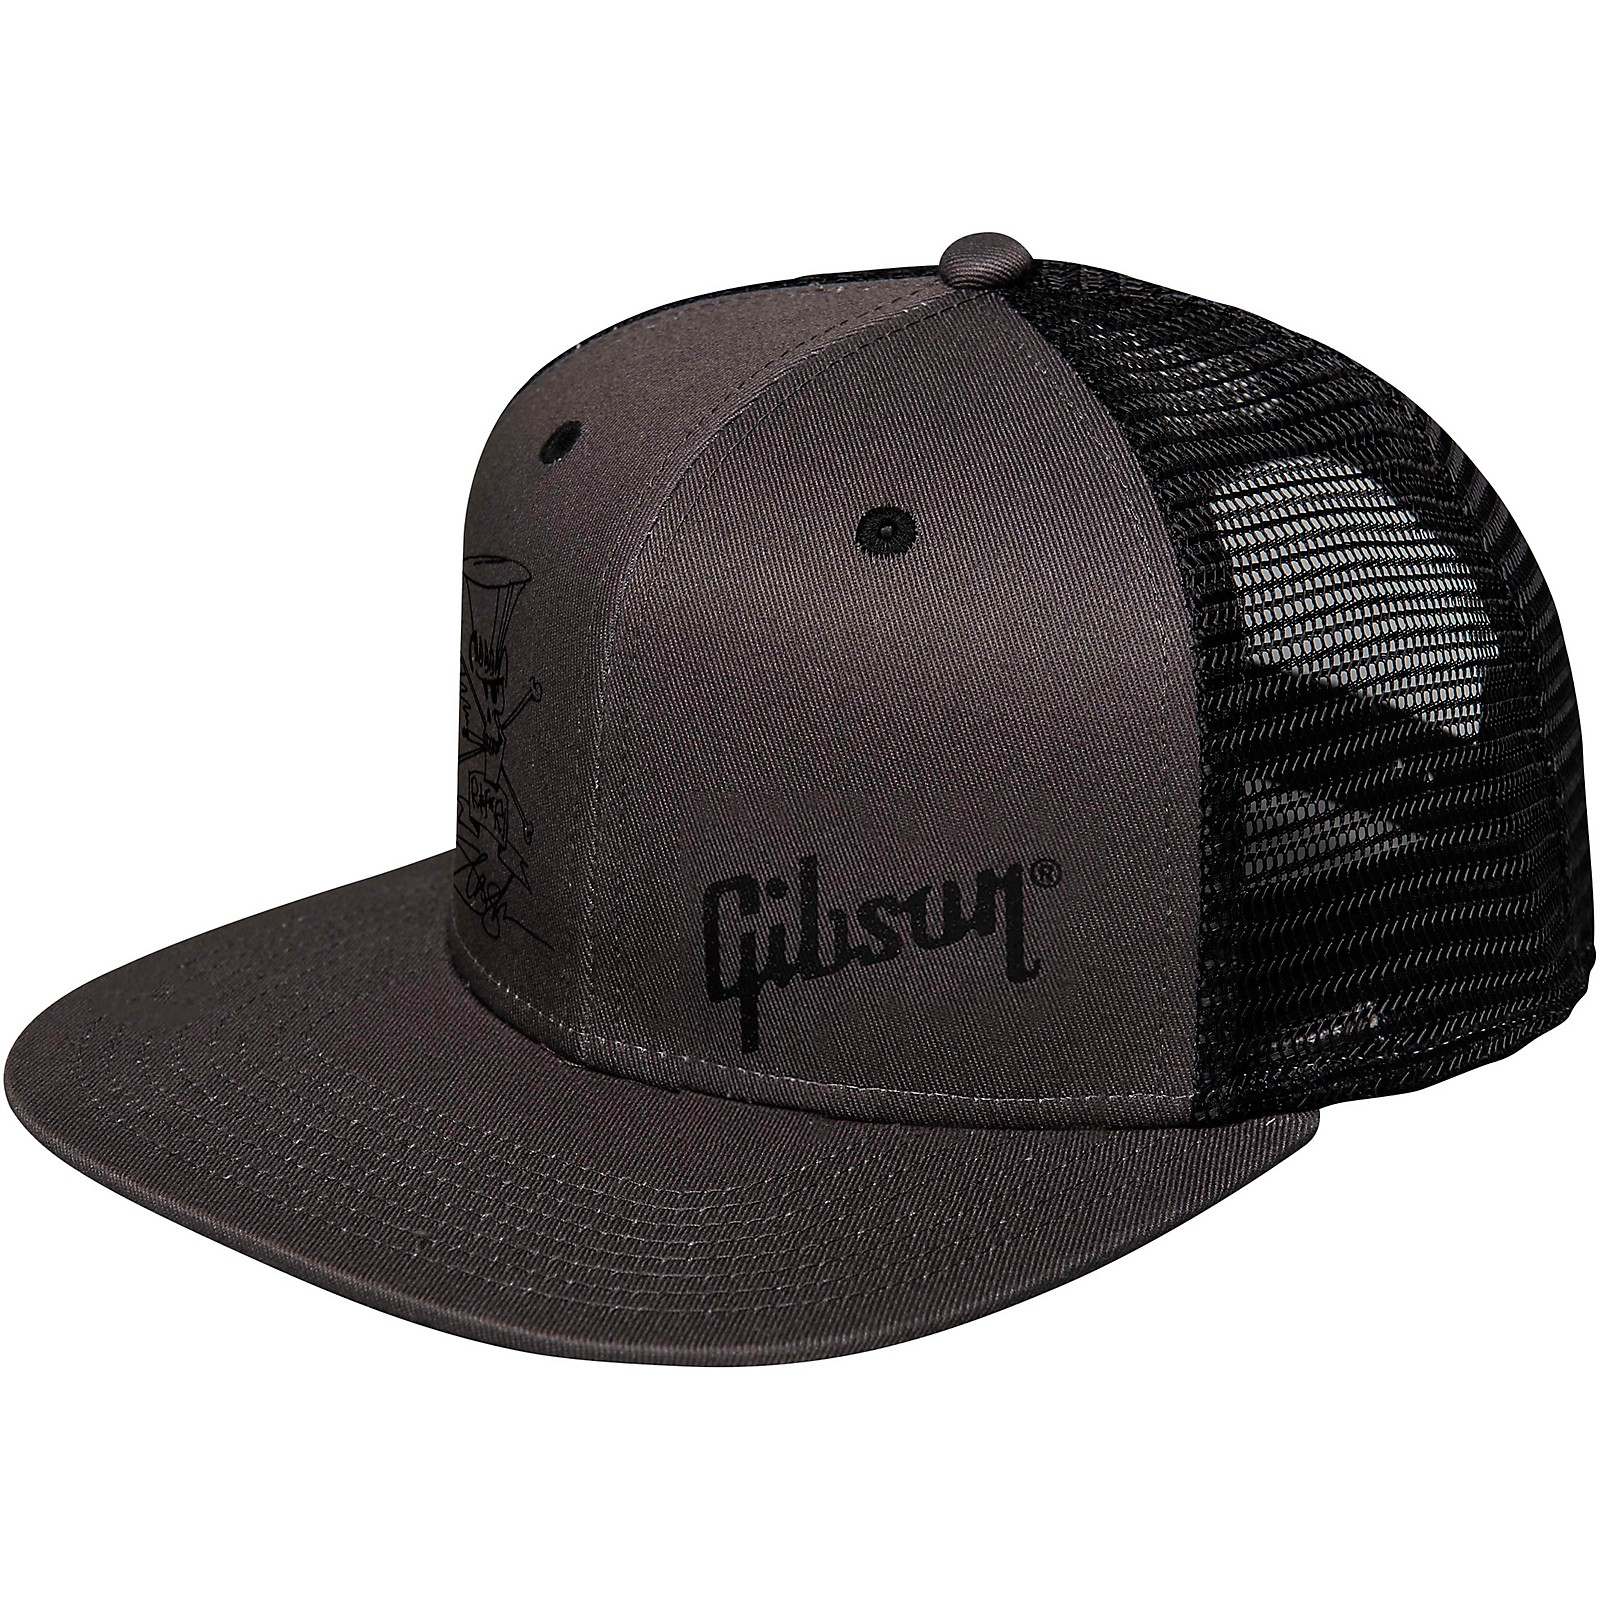 Gibson Slash Signature Trucker Hat